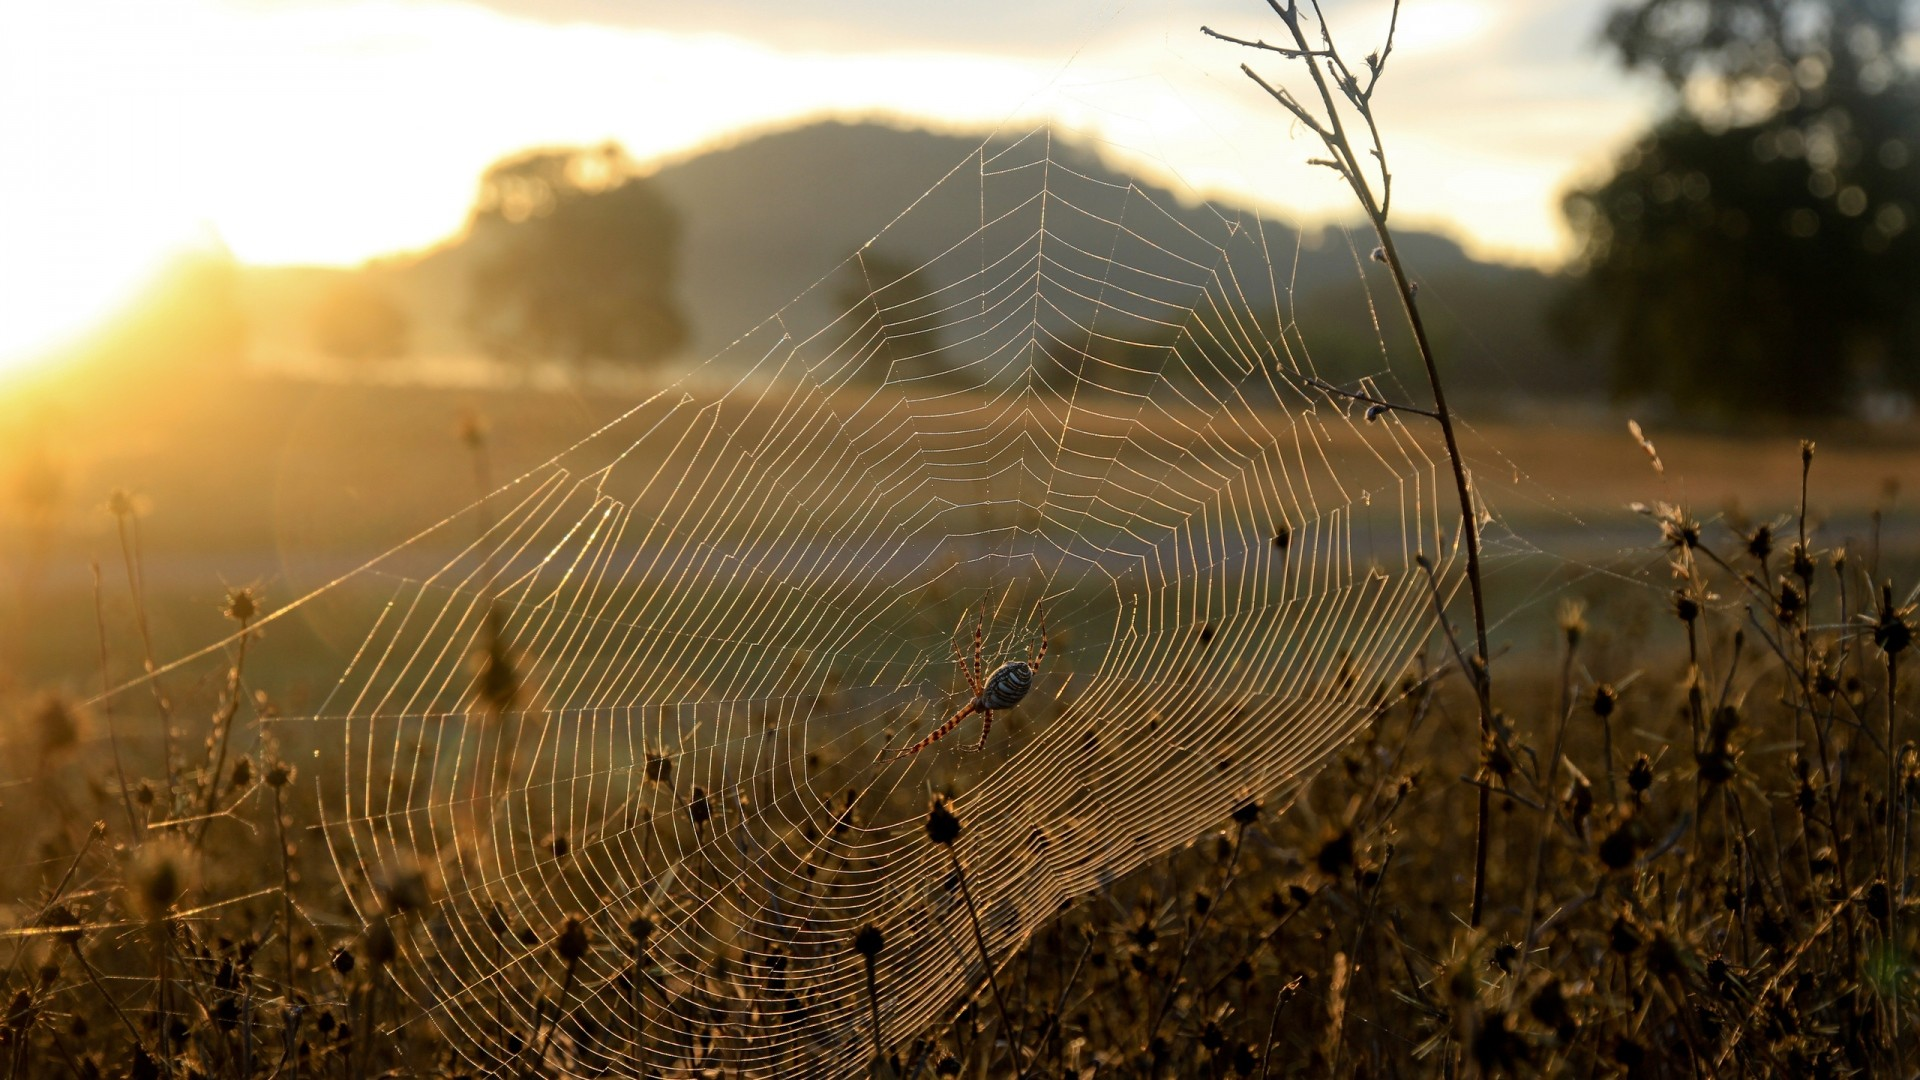 Wallpaper spider, web, sun, light, grass, dry, faded